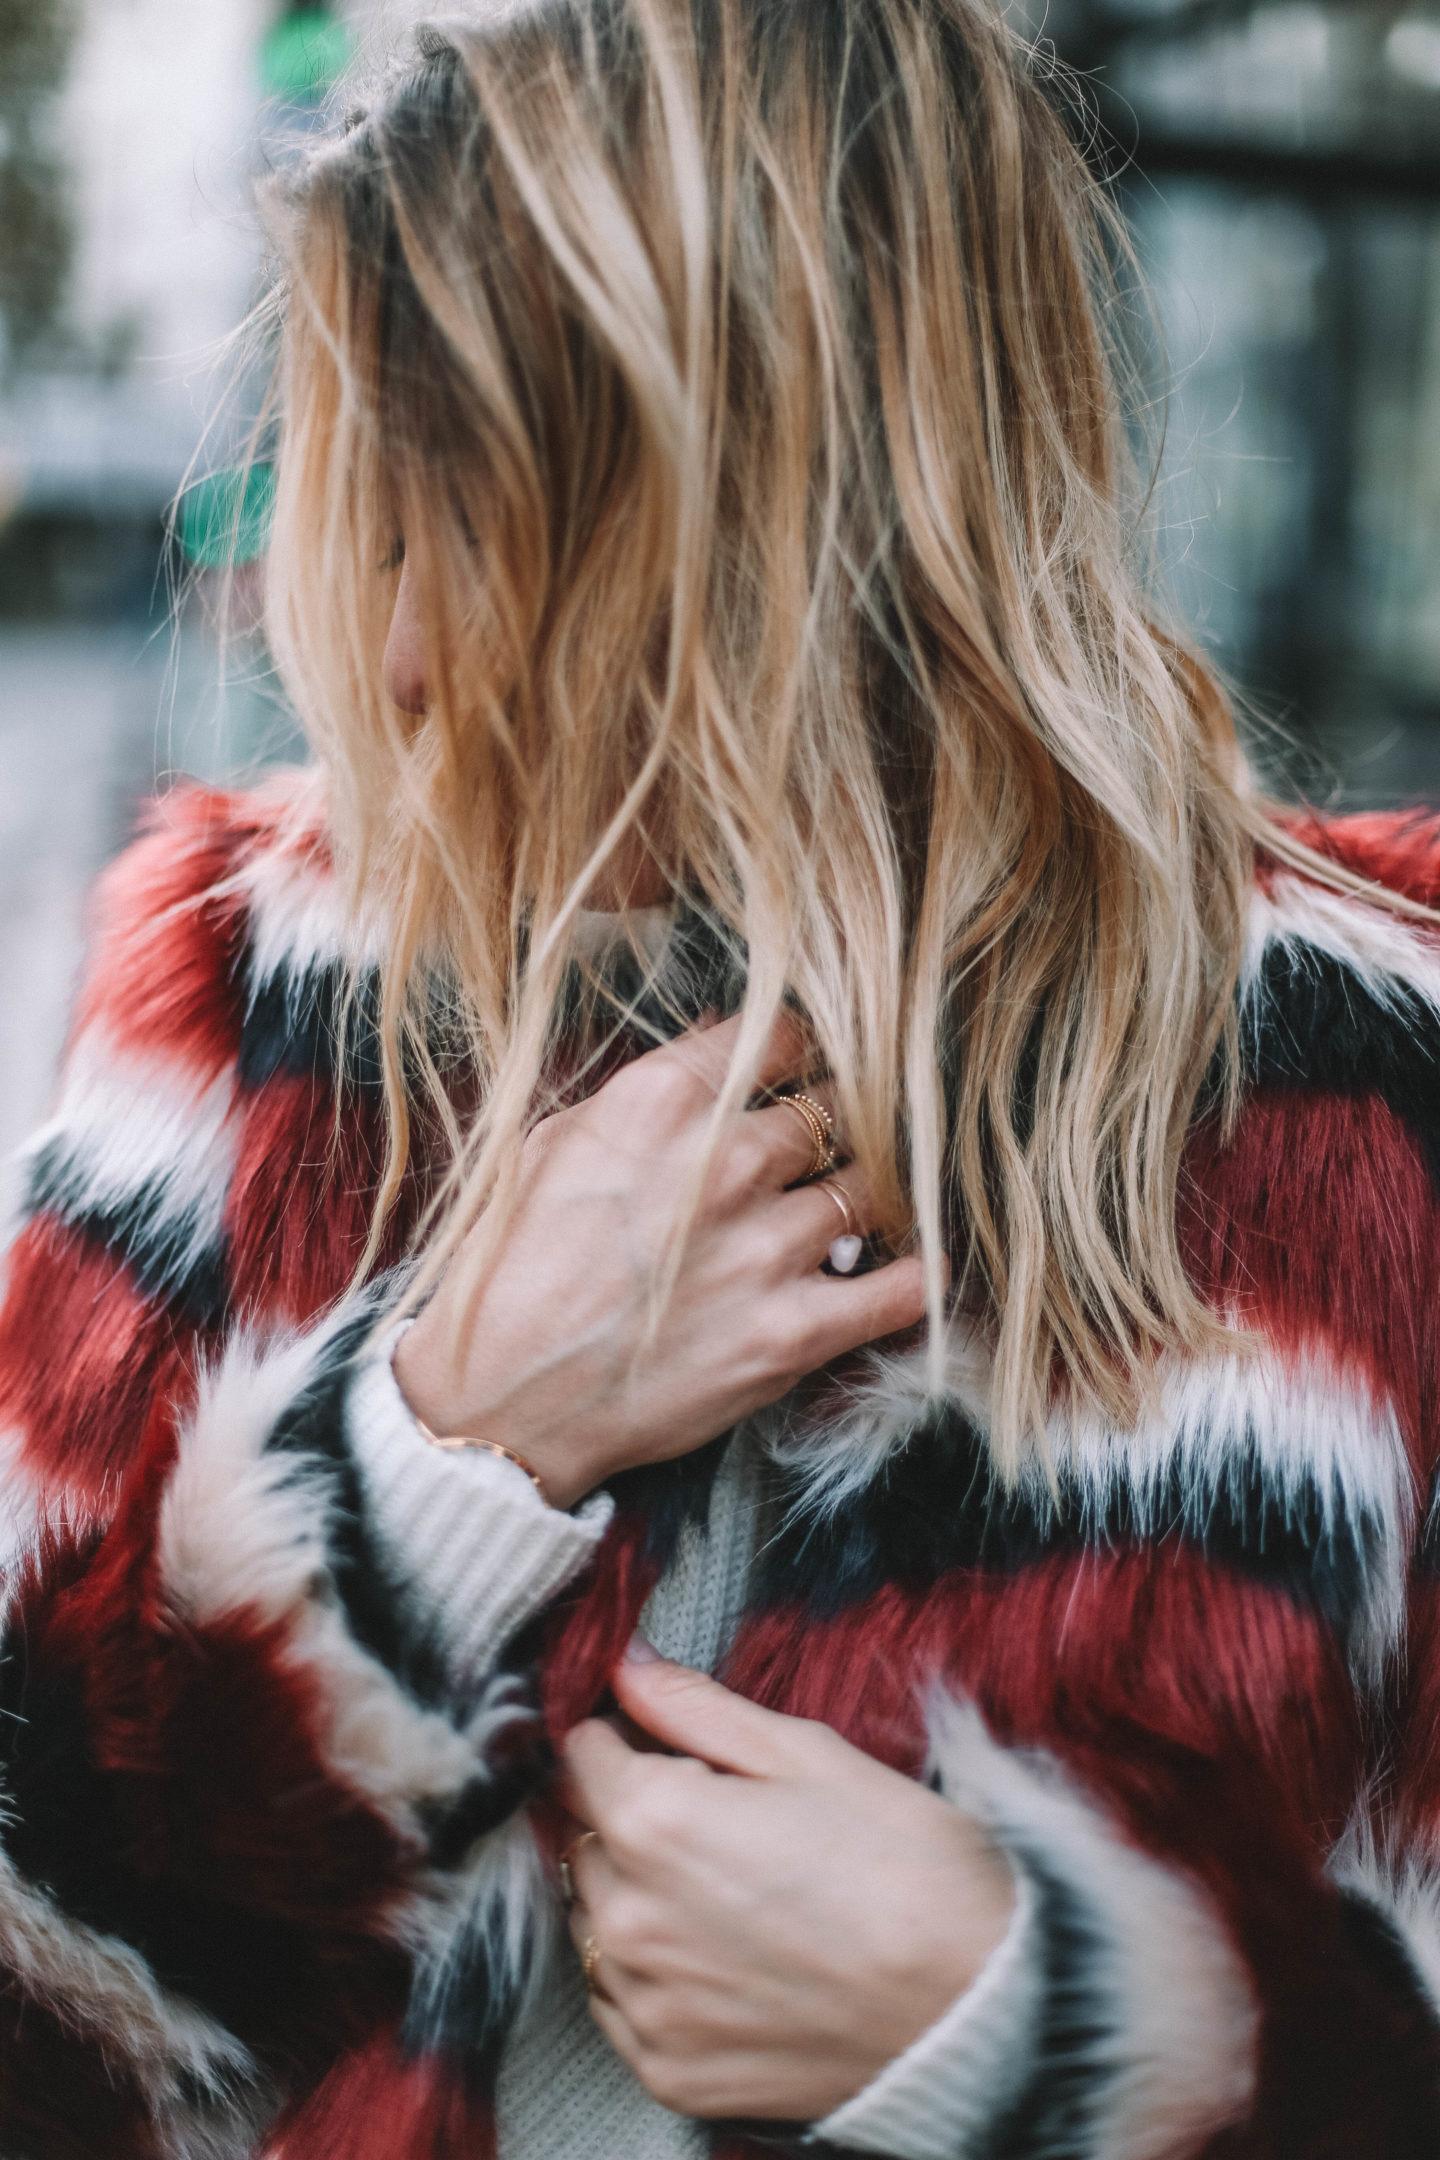 Vernissage Cheveux blonds Coiffirst - Blondie Baby blog mode et voyages